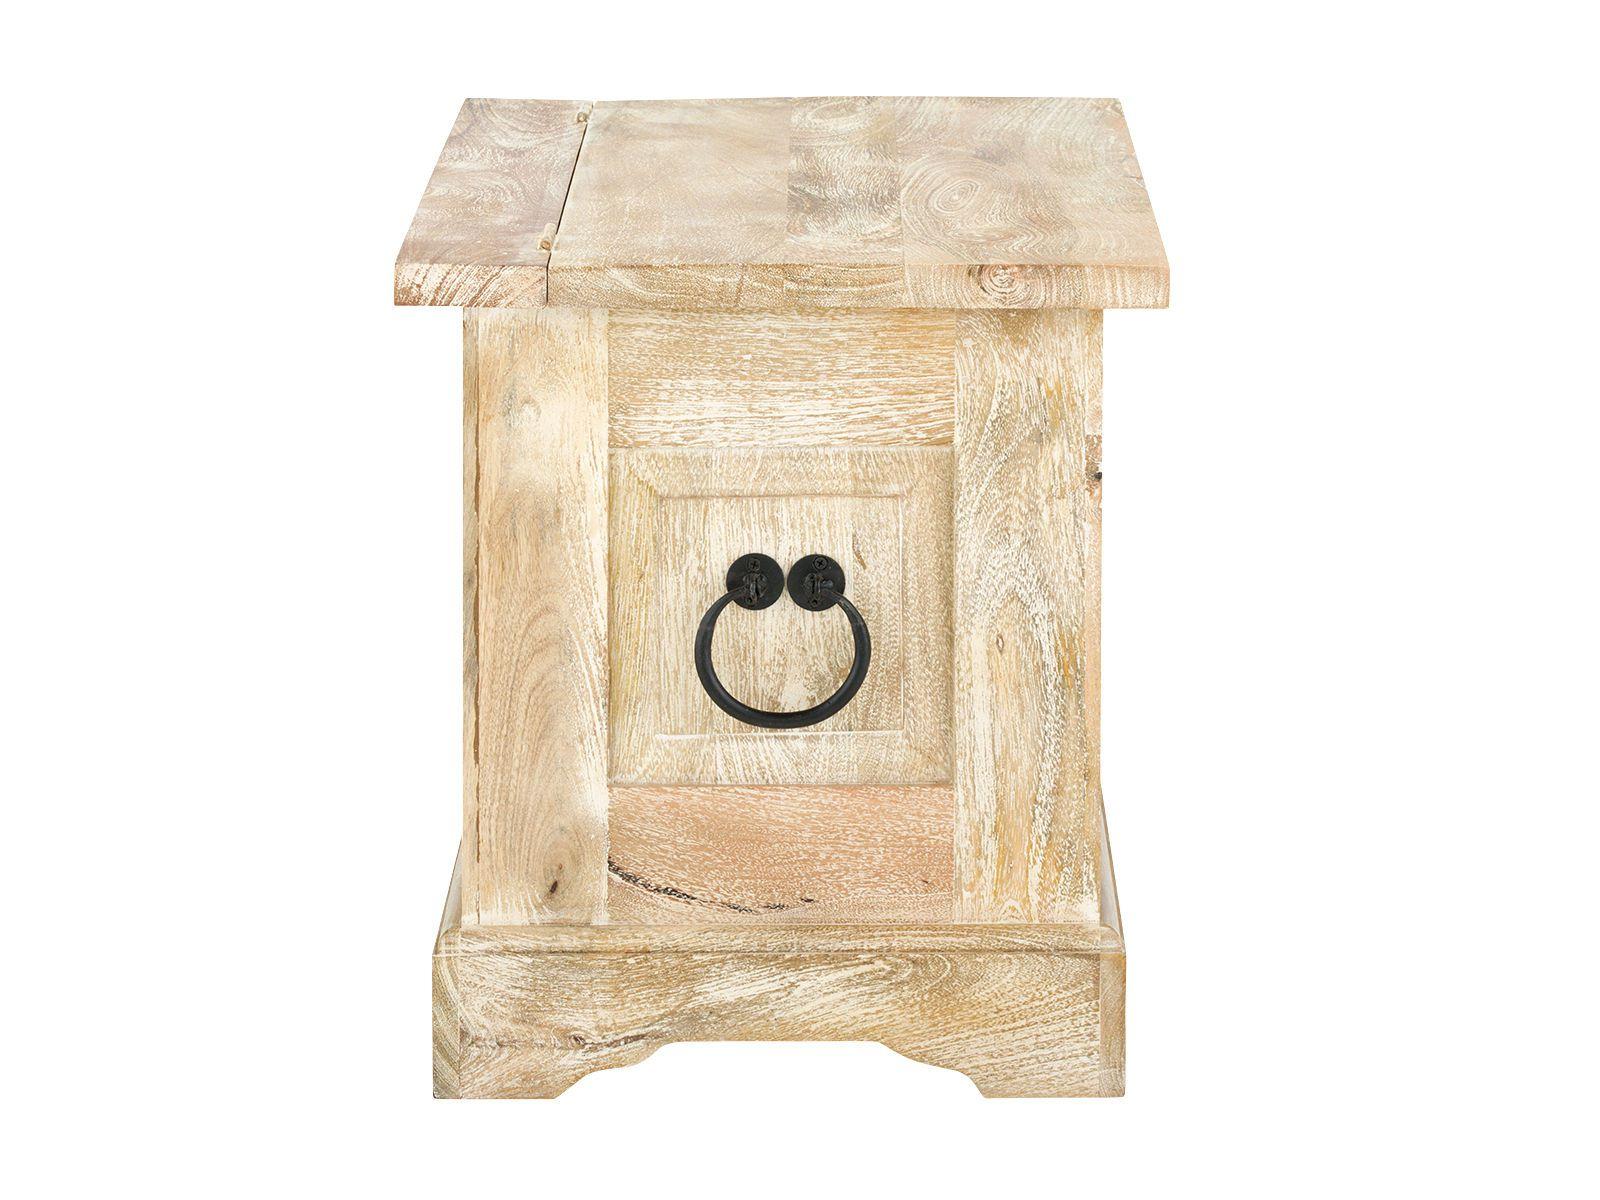 truhe patina truhen von massivum. Black Bedroom Furniture Sets. Home Design Ideas